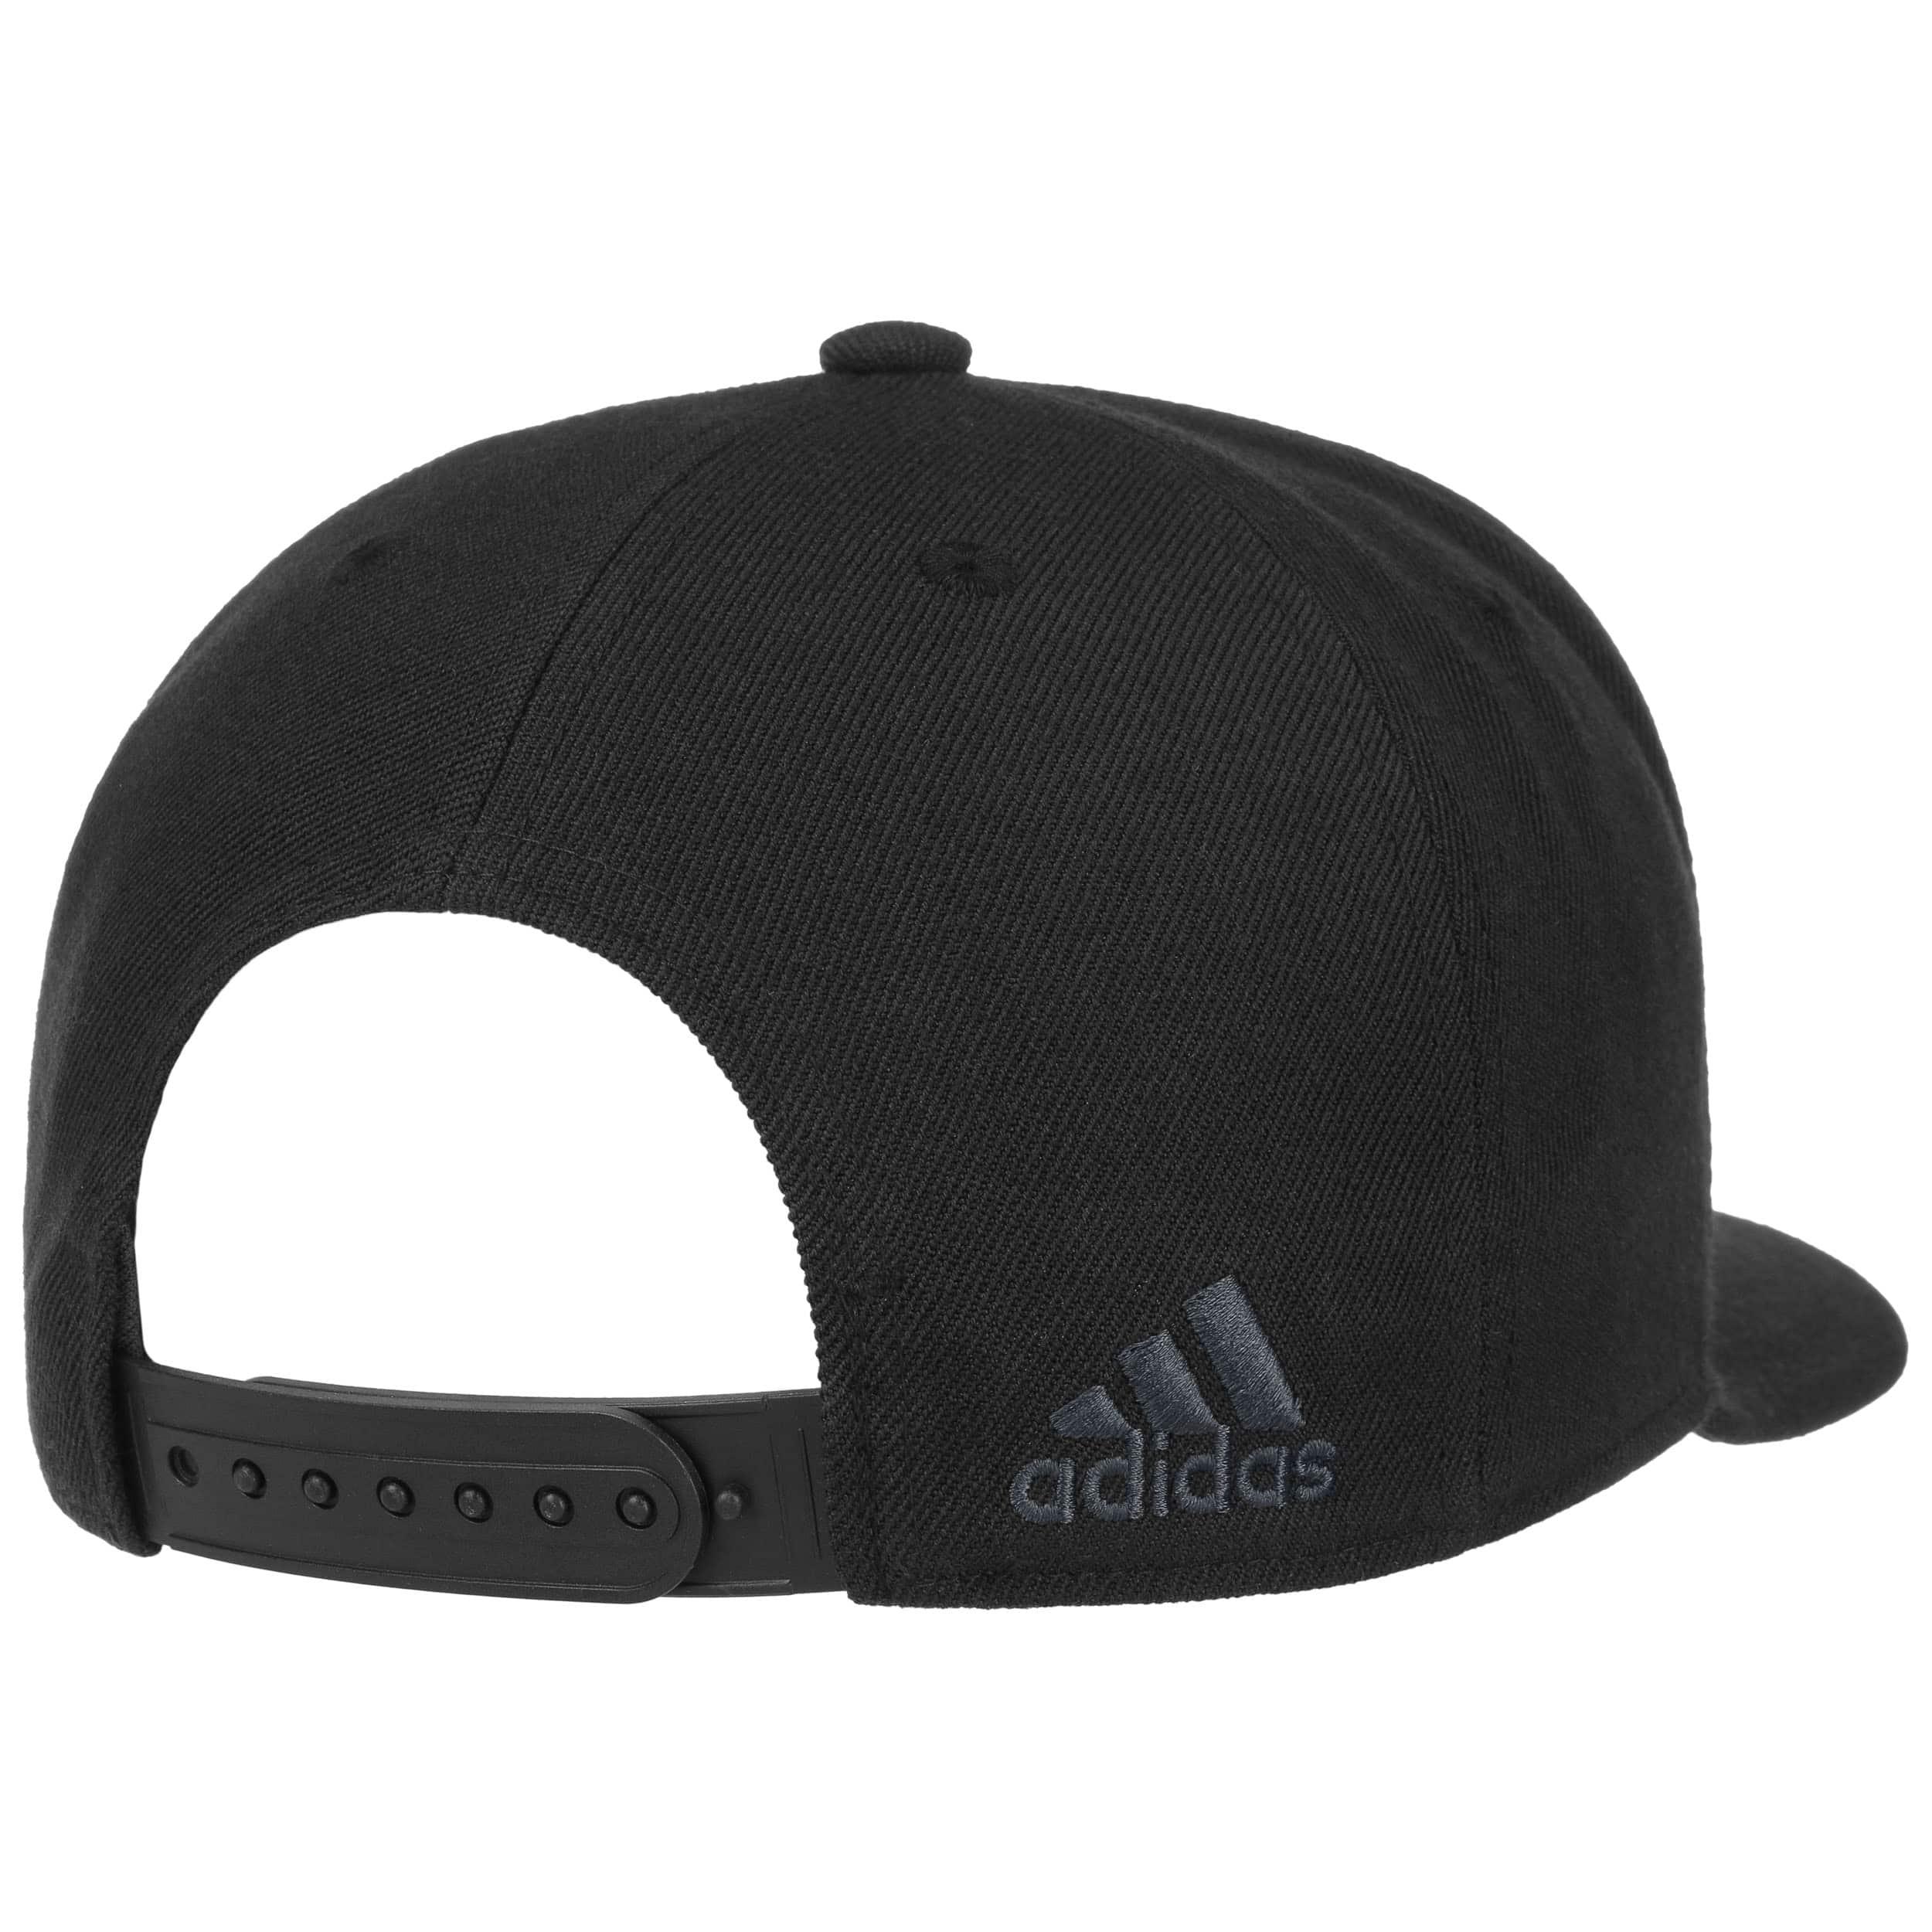 d2a2e0c8939 ... DFB Home Snapback Cap by adidas - black 3 ...